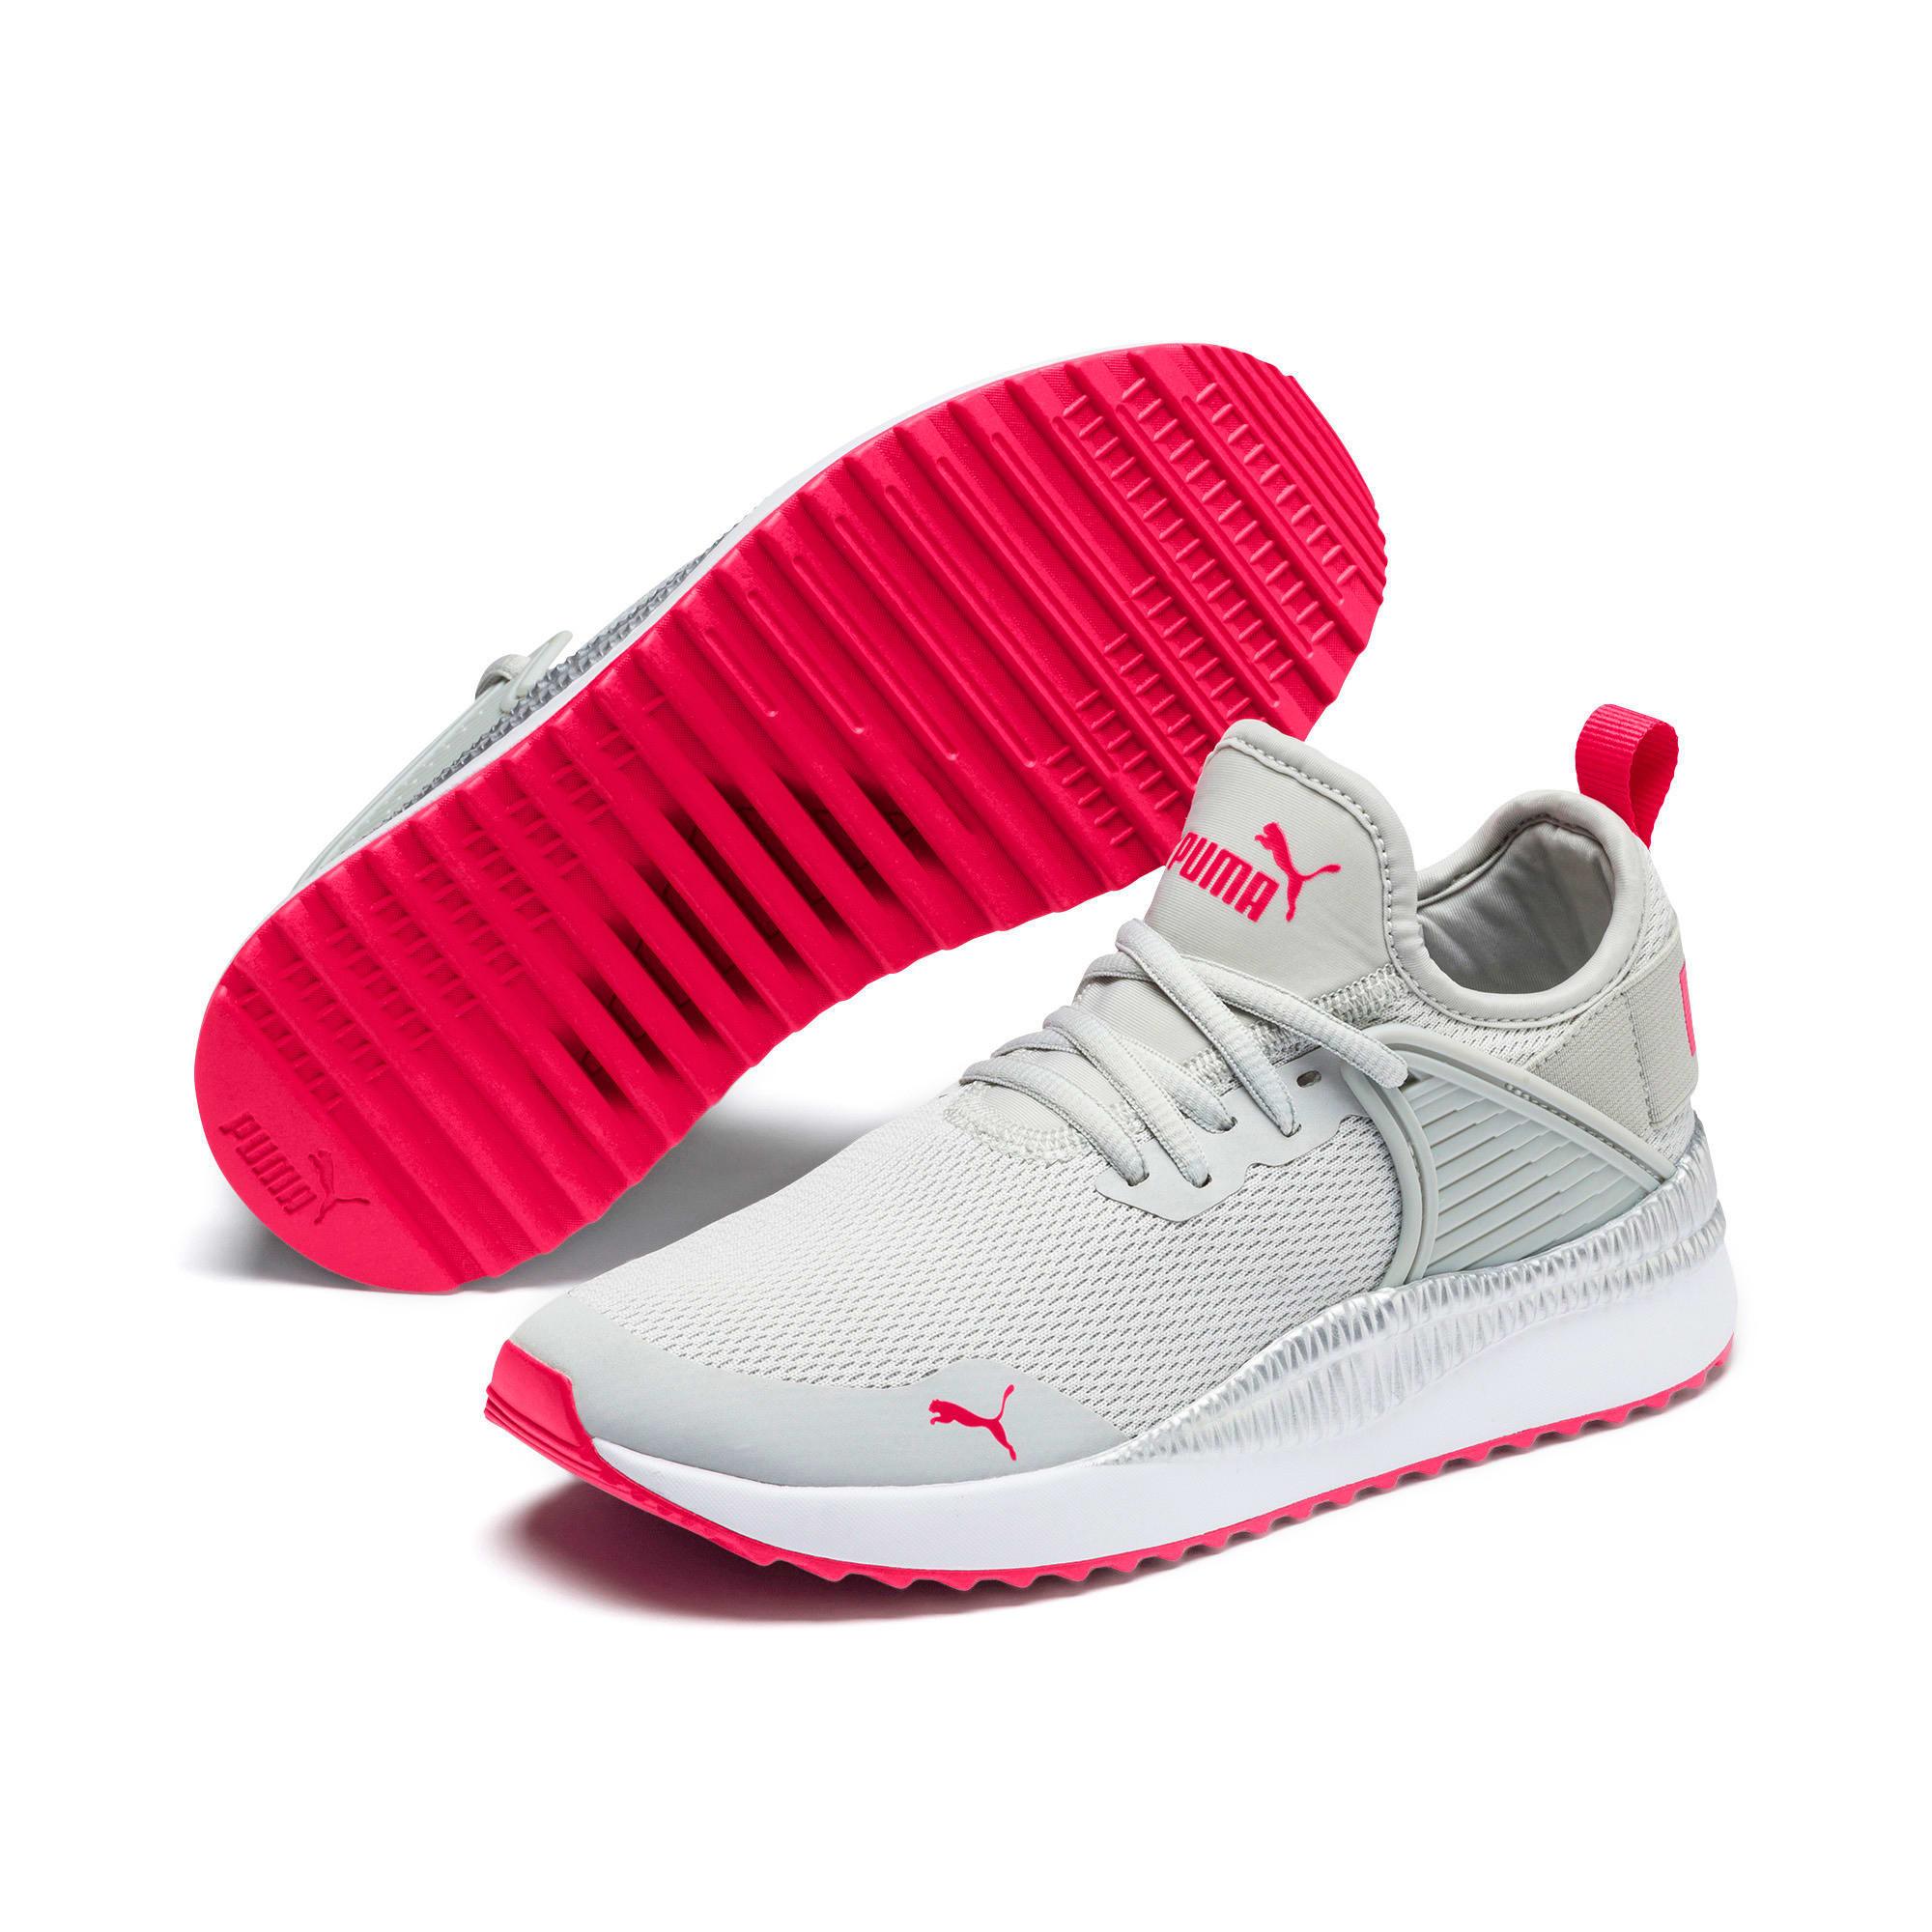 Thumbnail 2 of Pacer Next Cage Metallic Sneakers JR, Gray Violet-Nrgy Rose, medium